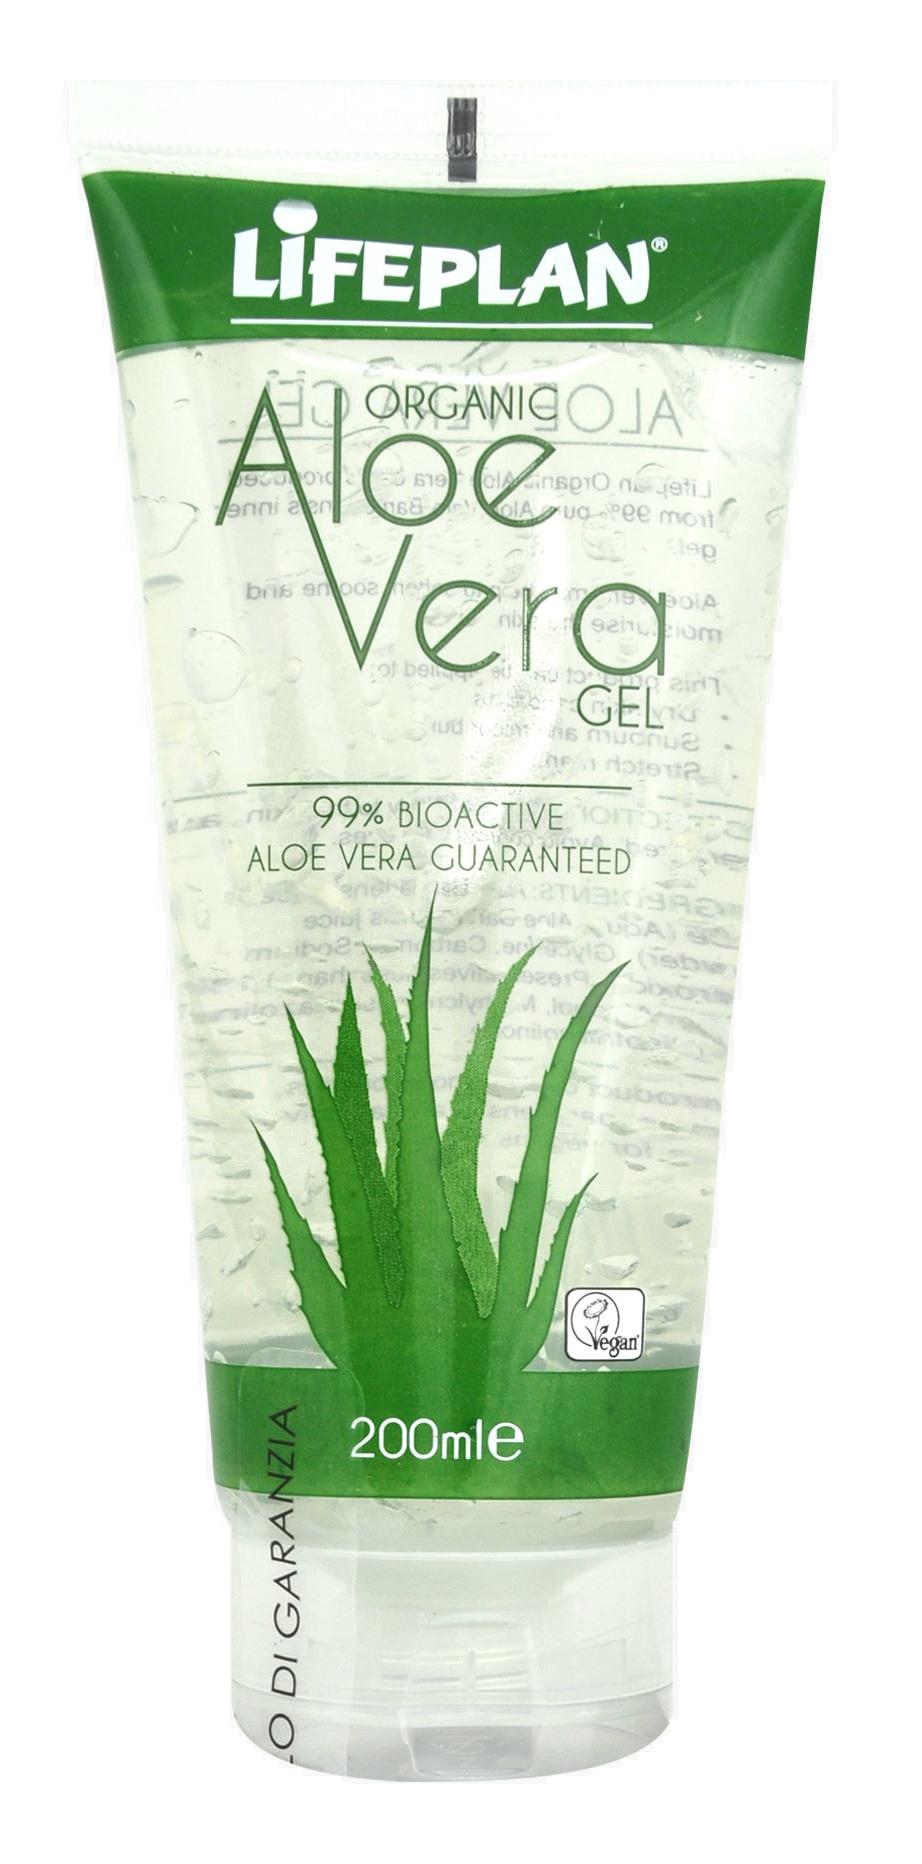 LIFEPLAN Organic Aloe Vera Gel